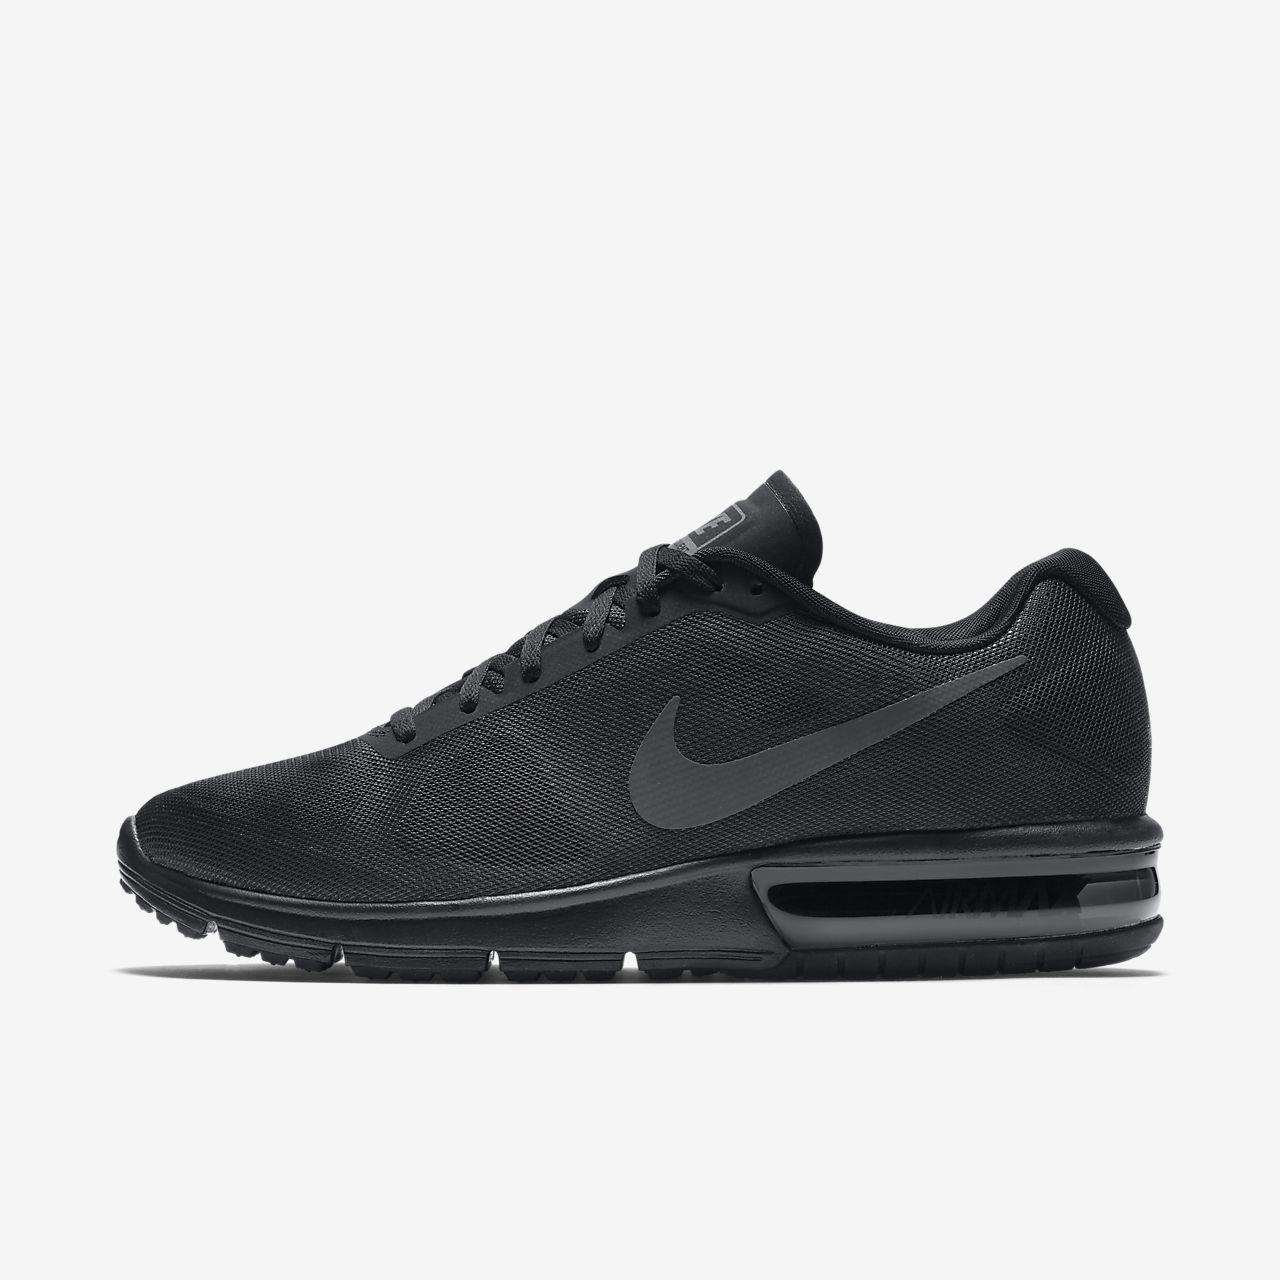 best sneakers 44b3a 532bb Running Air Chaussure Fr Nike Pour De Homme Max Sequent RpwFSqx